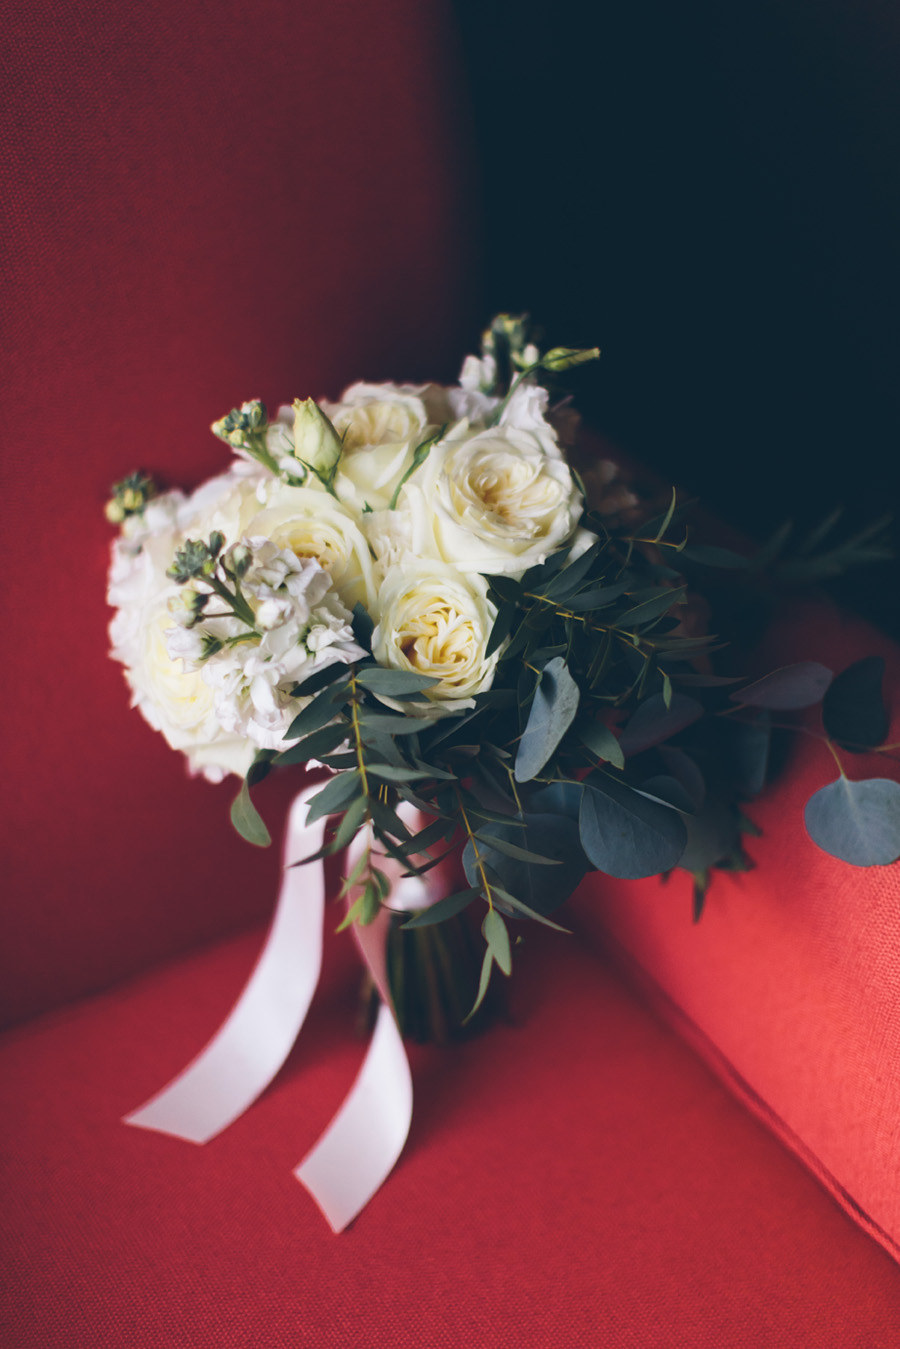 VICTORIA-BRIAN-NY-WEDDING-DETAILS-CYNTHIACHUNG-0014.jpg